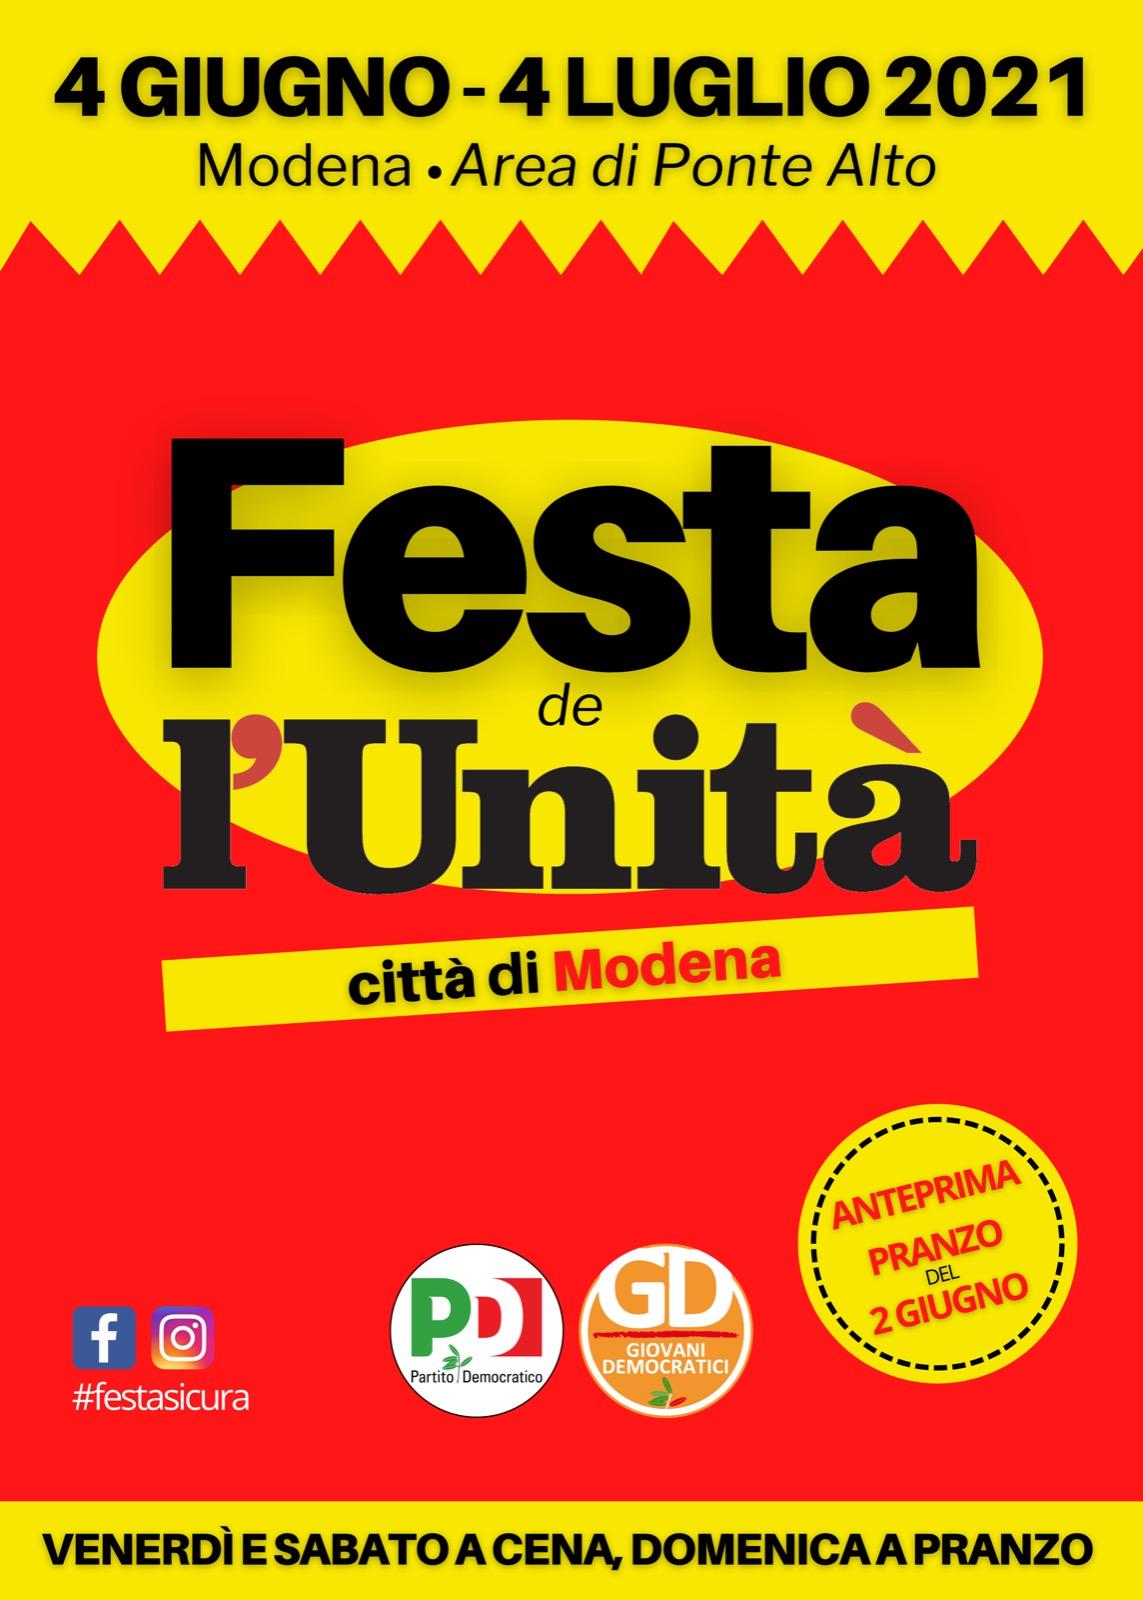 Festa de l'Unità città di Modena